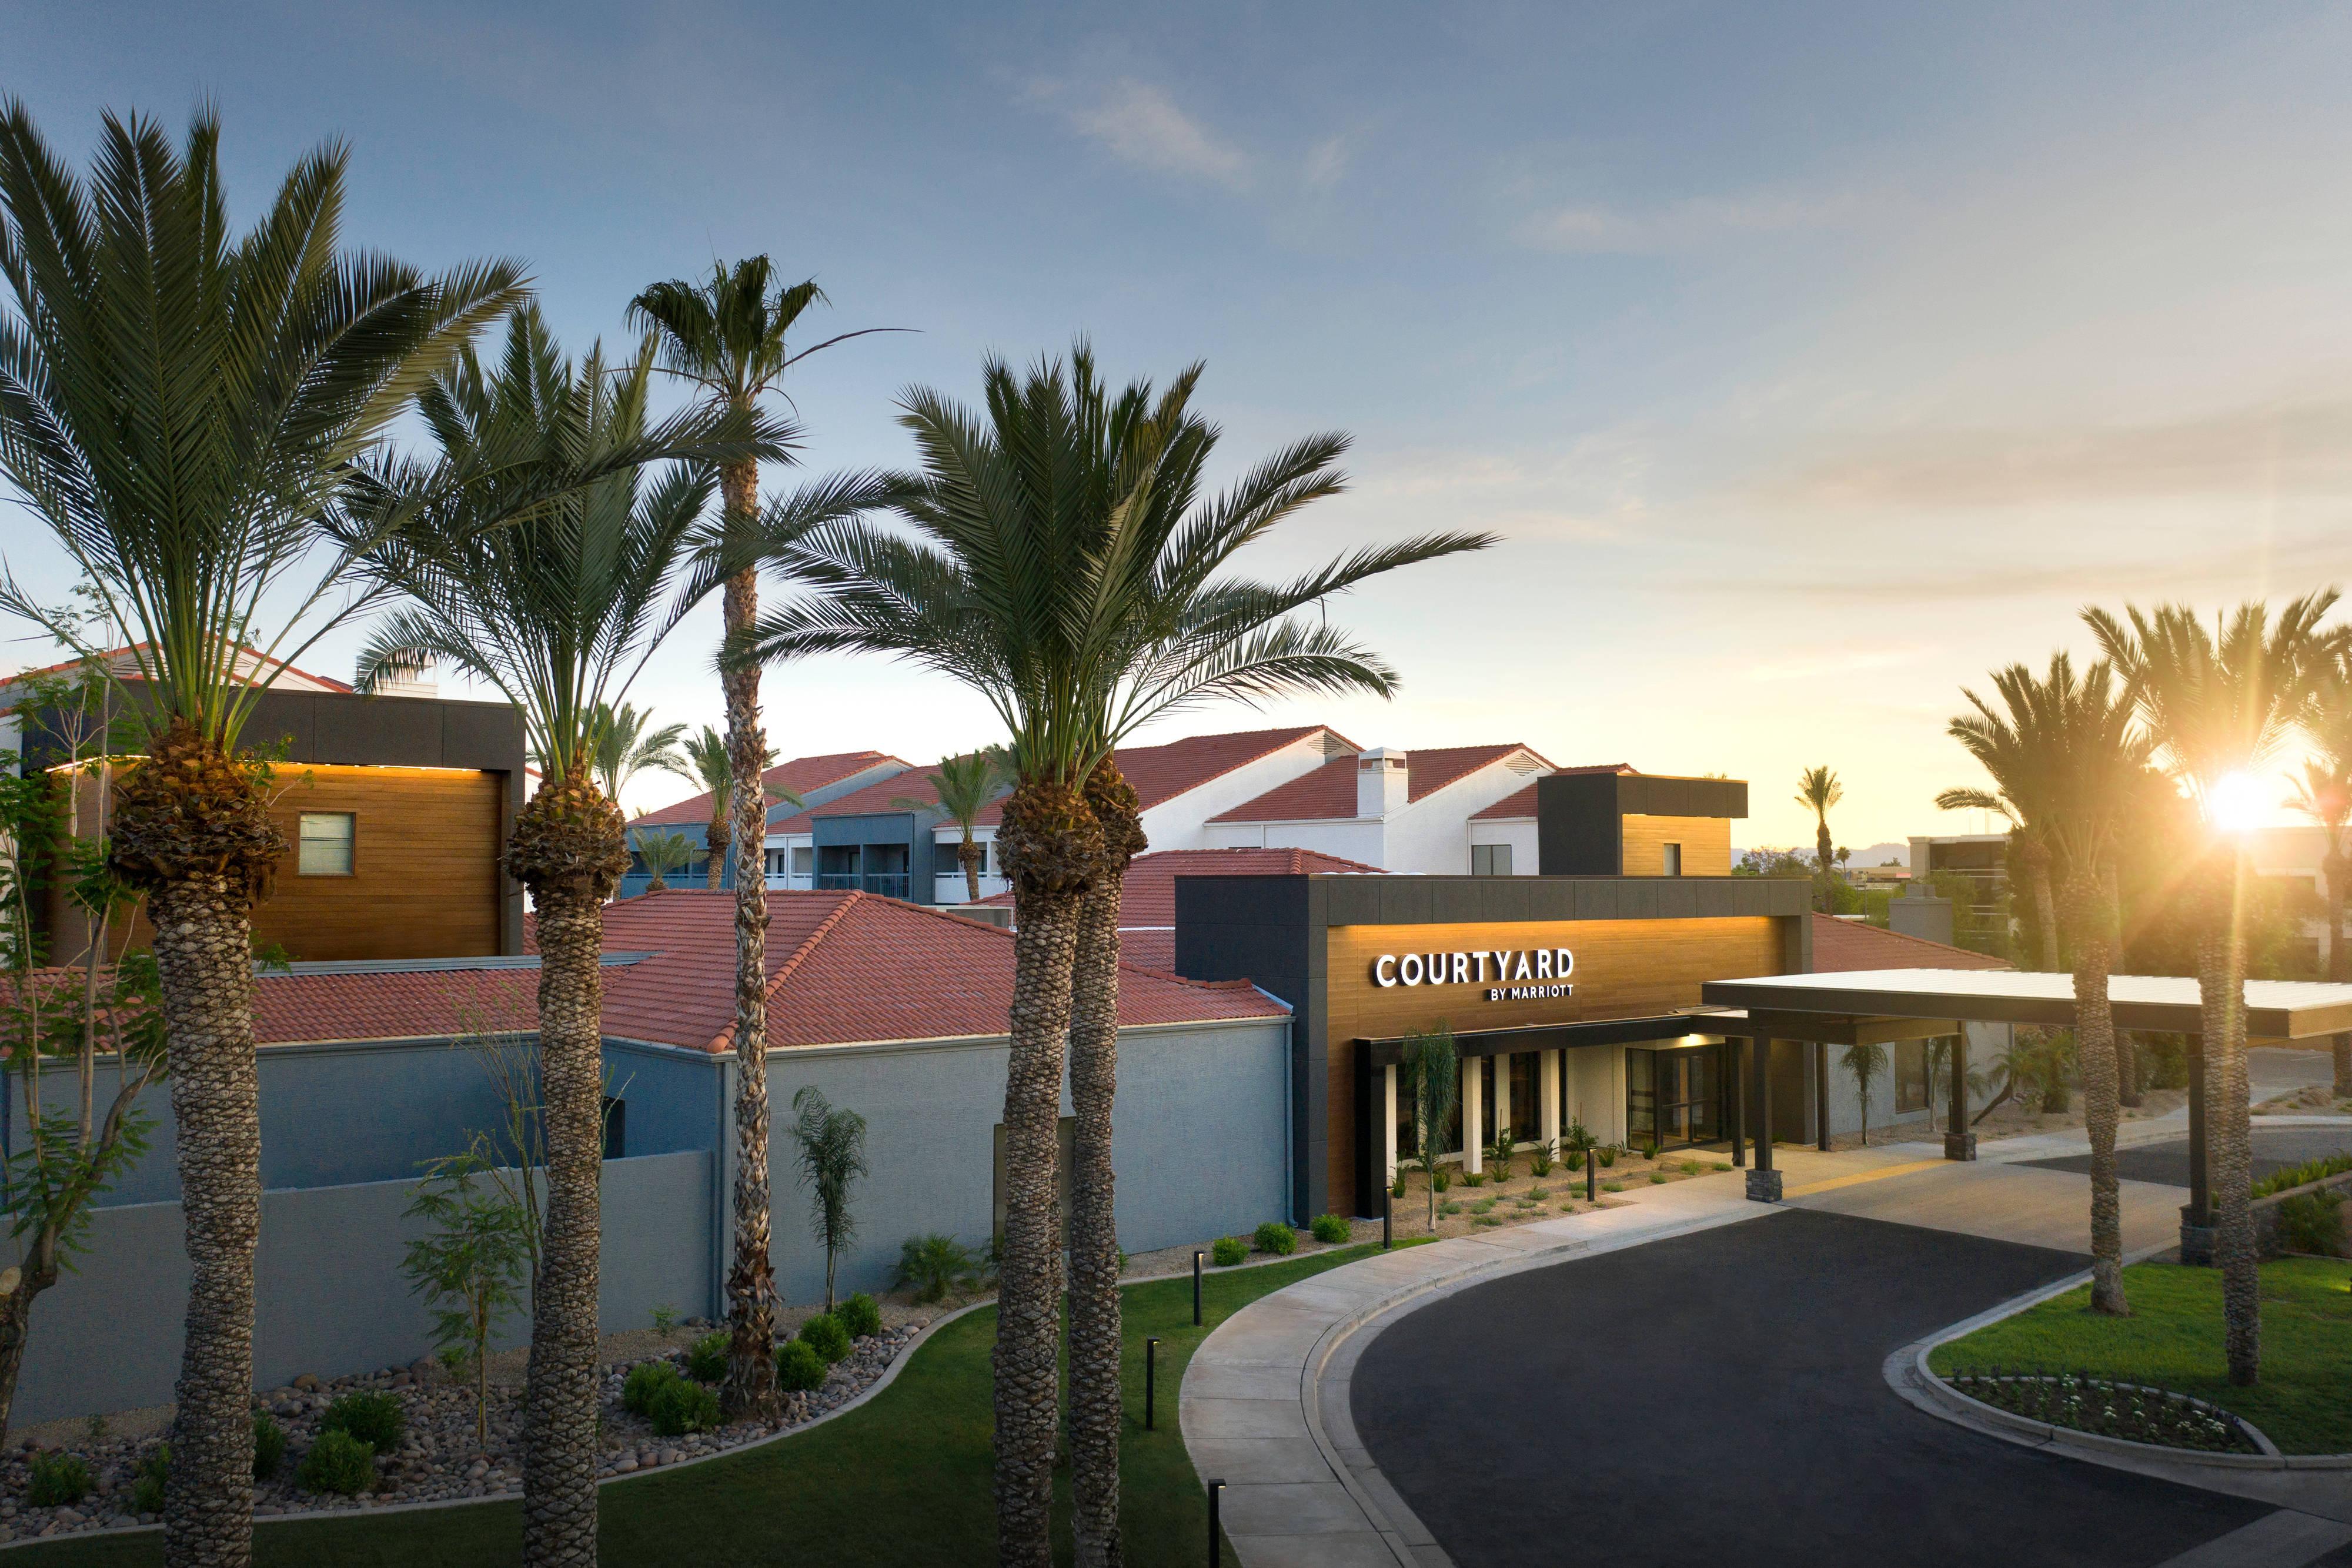 Courtyard by Marriott Phoenix Mesa